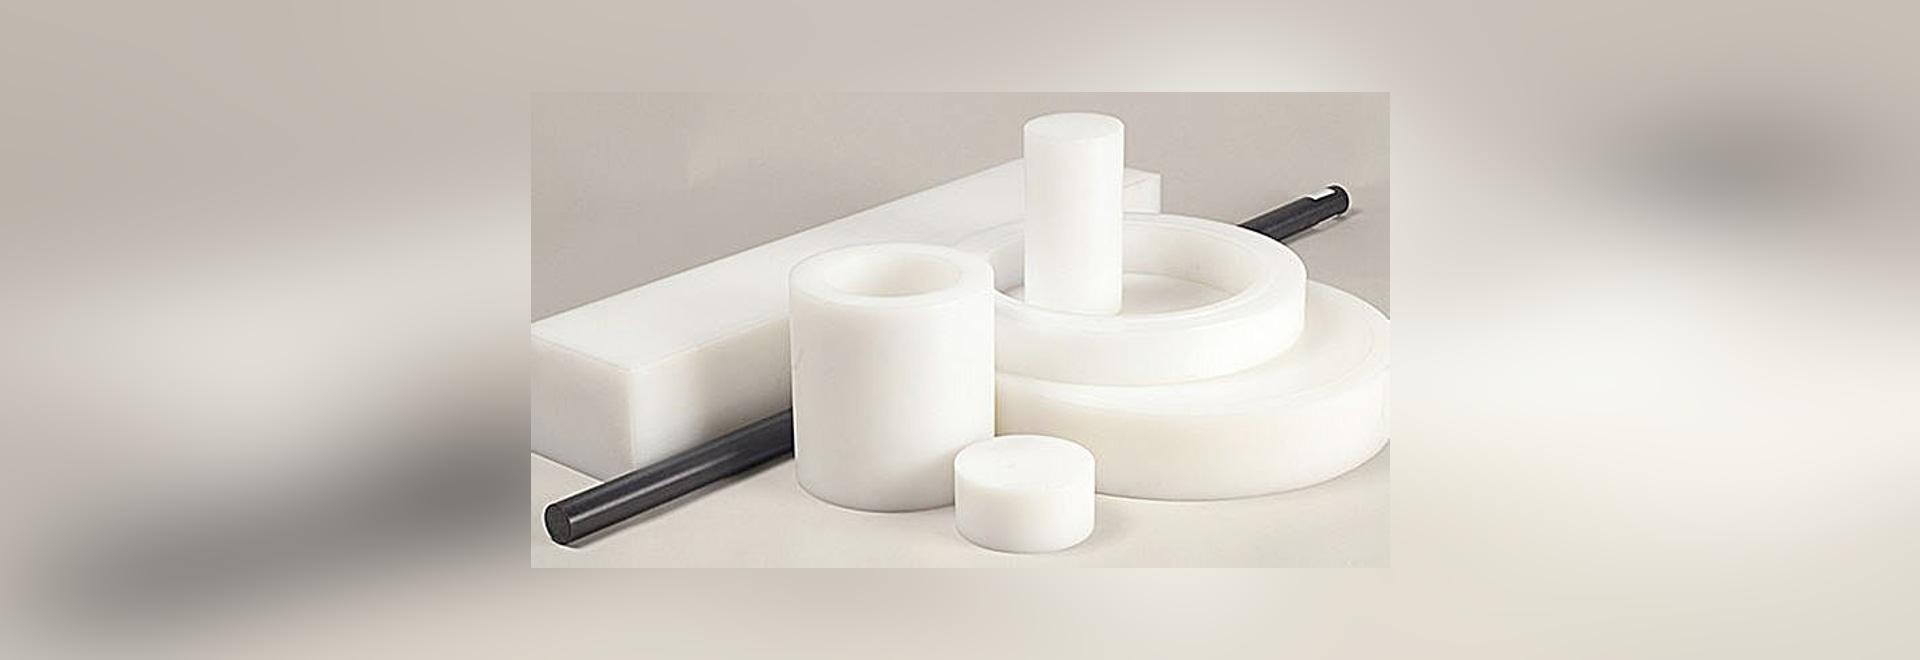 Ultra High Molecular Weight Polyethylene (UHMW-PE)